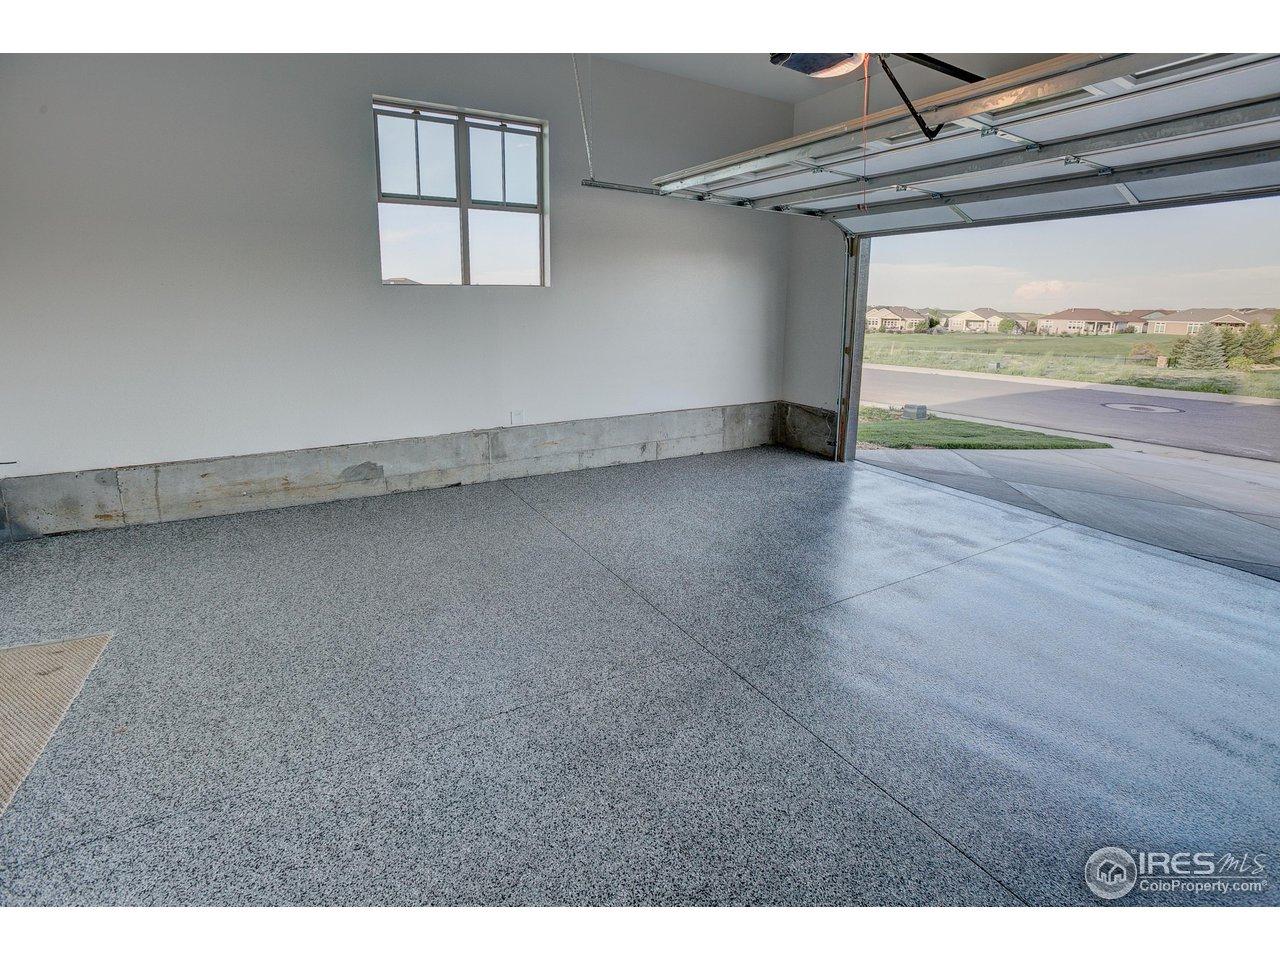 Polyaspartic coating  in garage